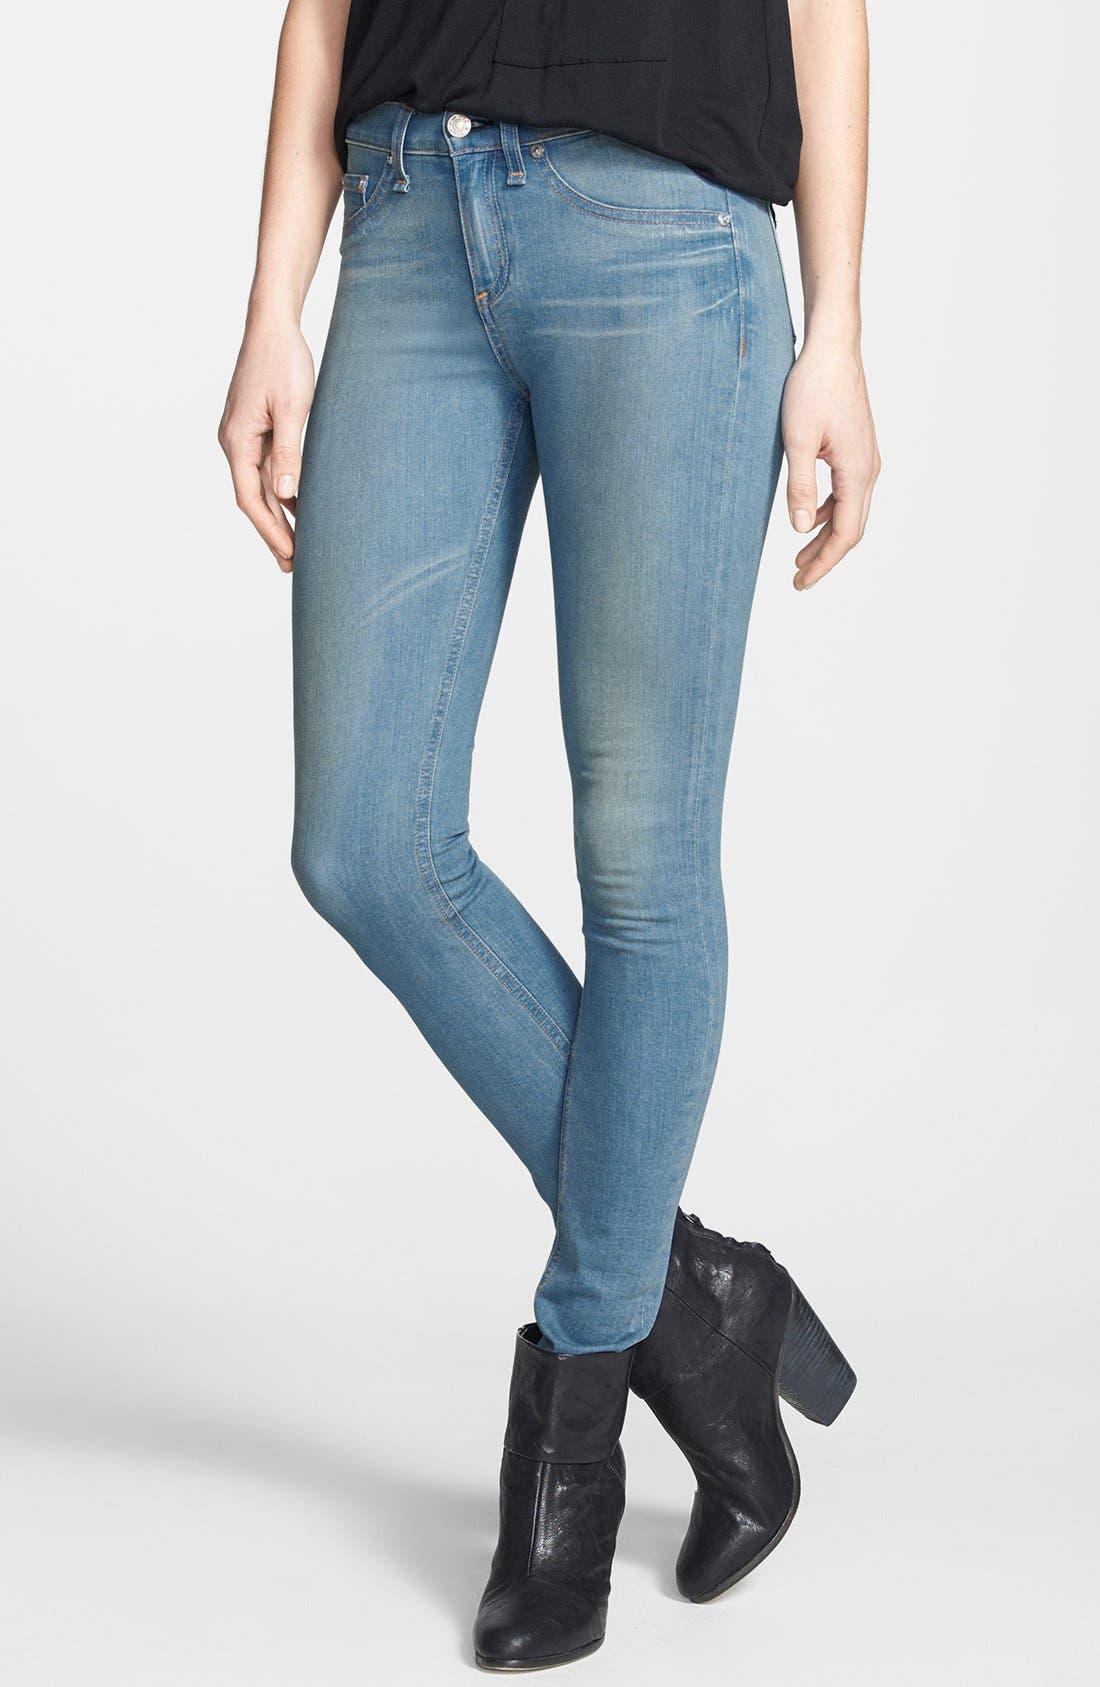 Alternate Image 1 Selected - rag & bone/JEAN High Rise Skinny Jeans (Calvary)